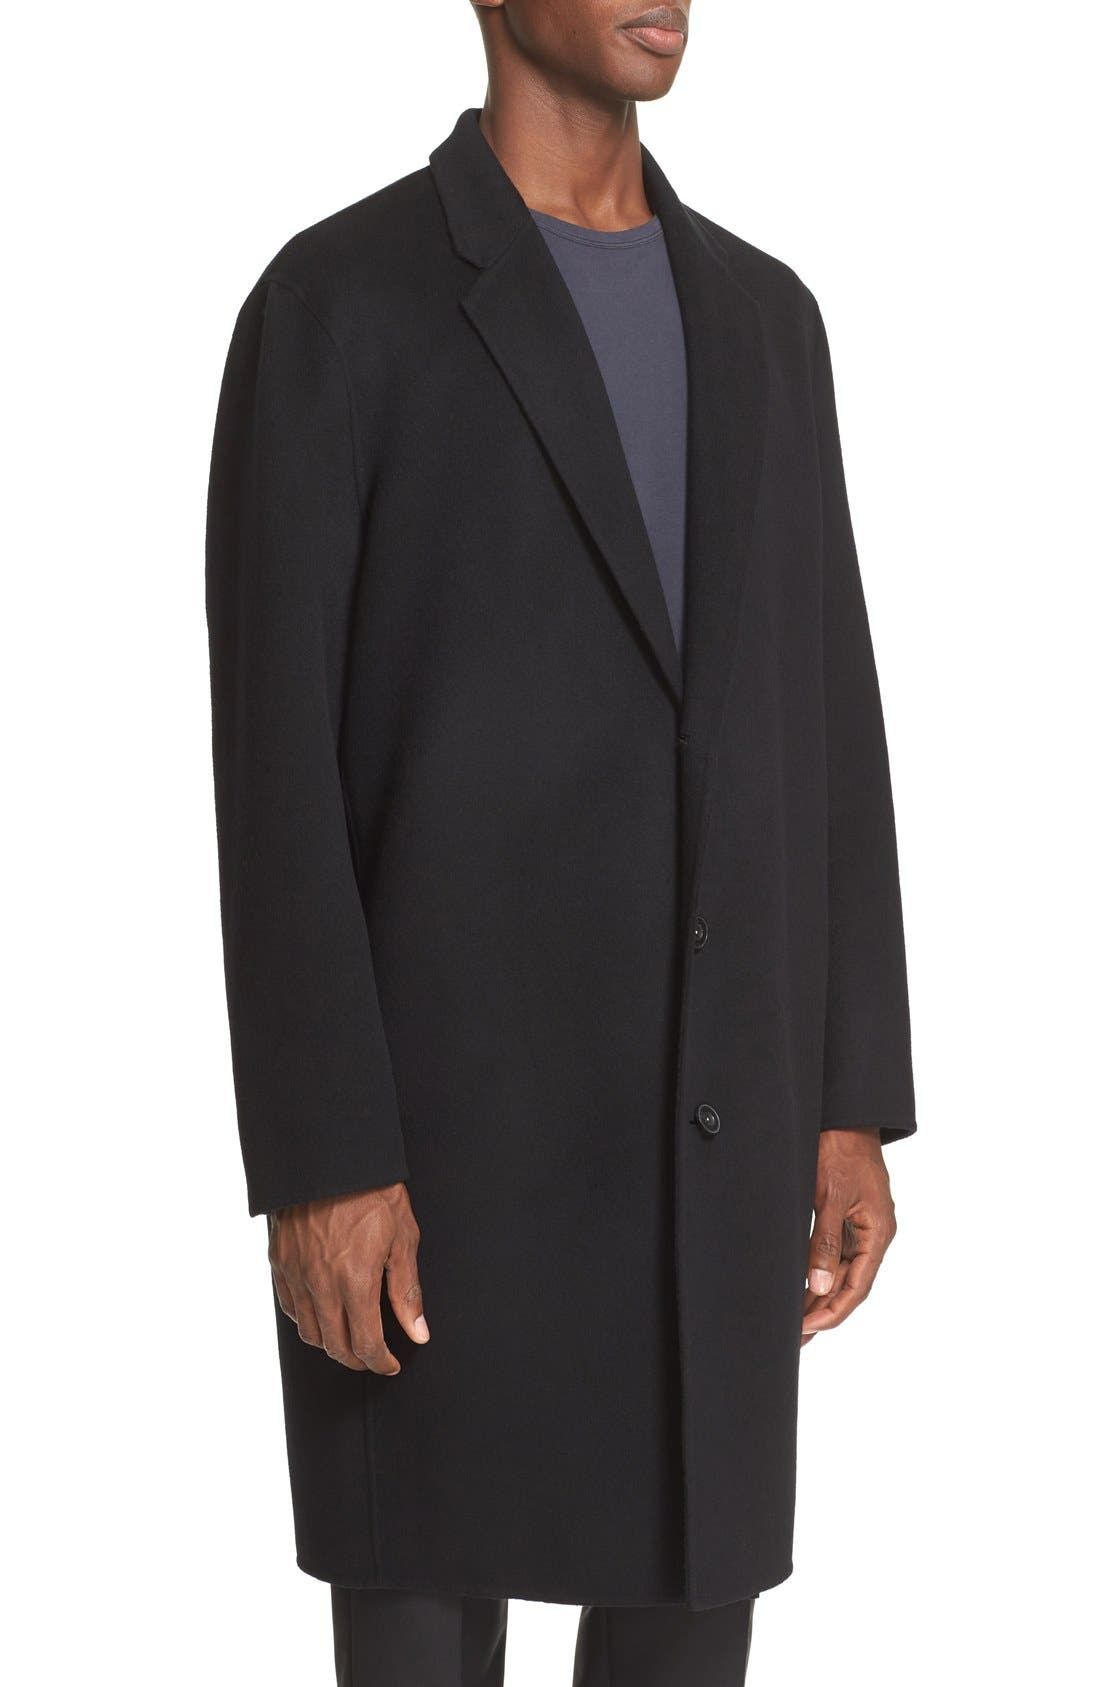 Charles Wool & Cashmere Coat,                             Alternate thumbnail 4, color,                             Black